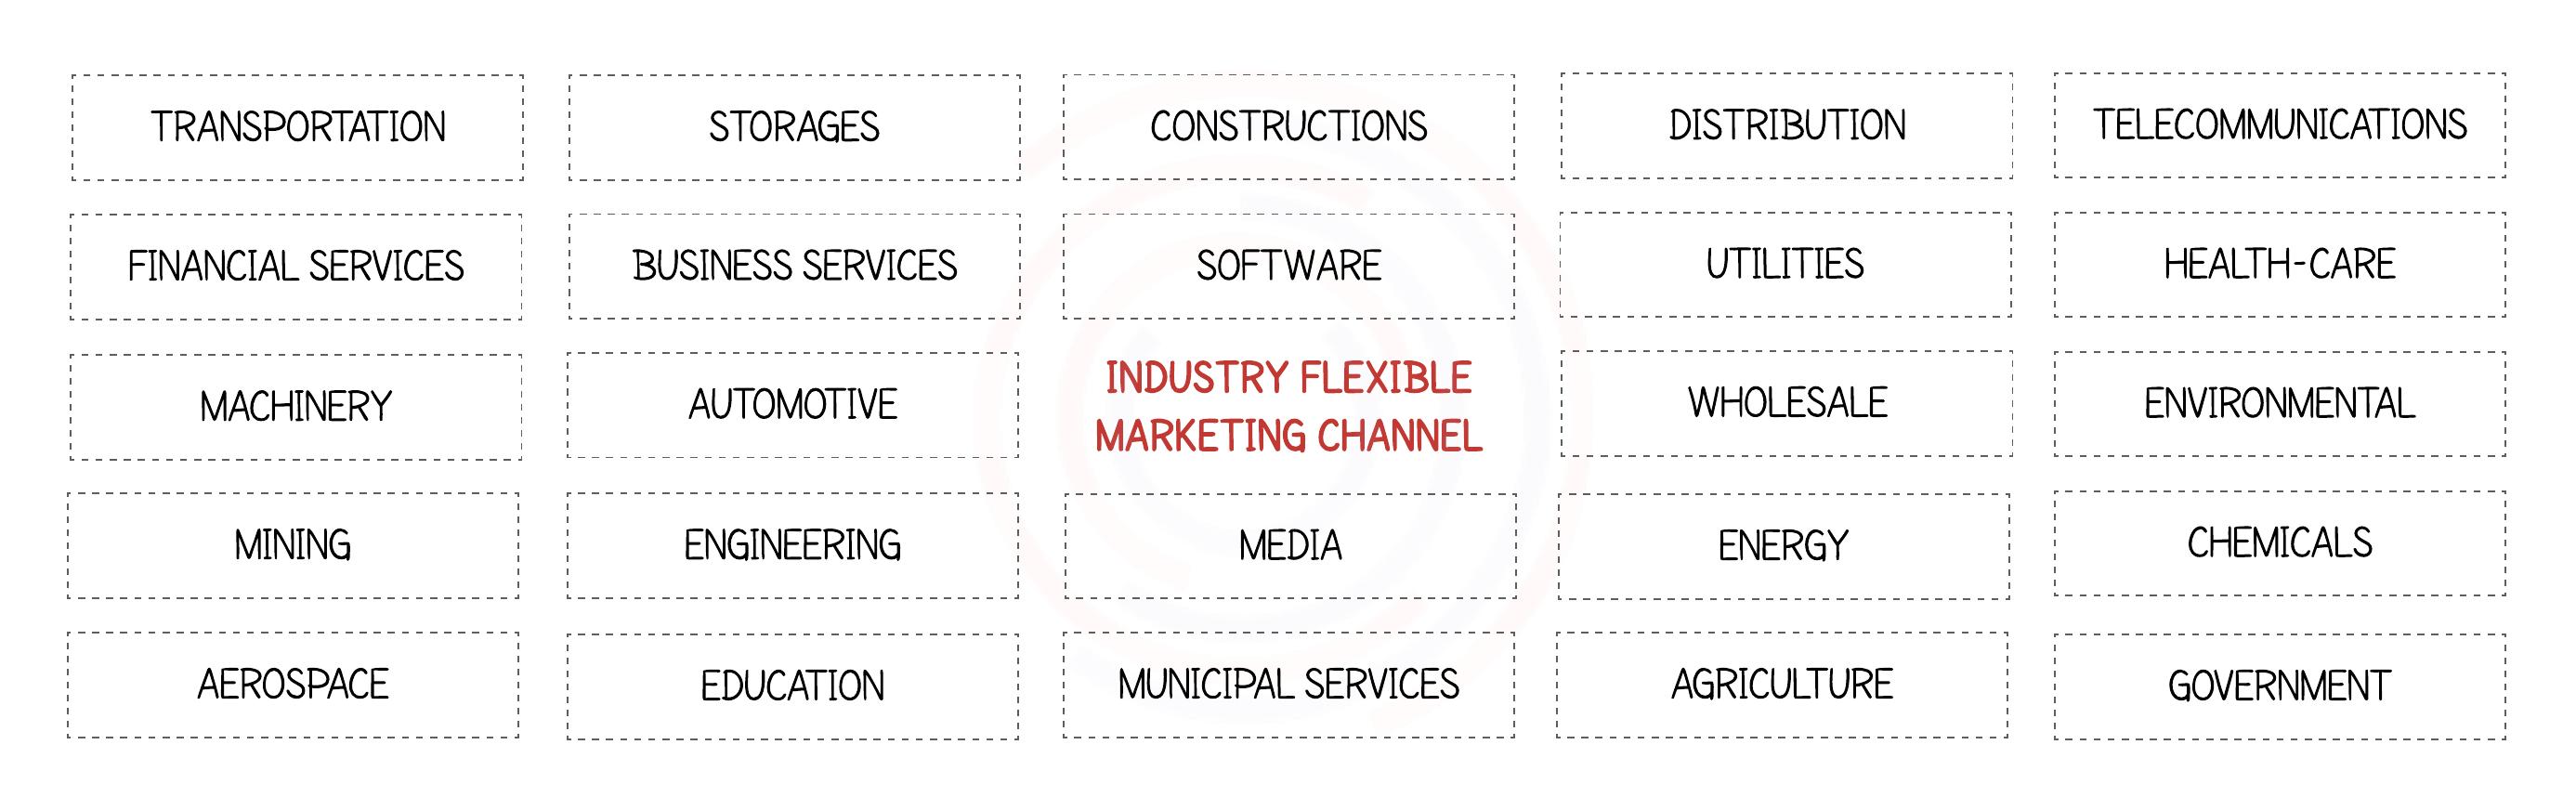 global data driven digital marketing agency business leads tenders smart cities